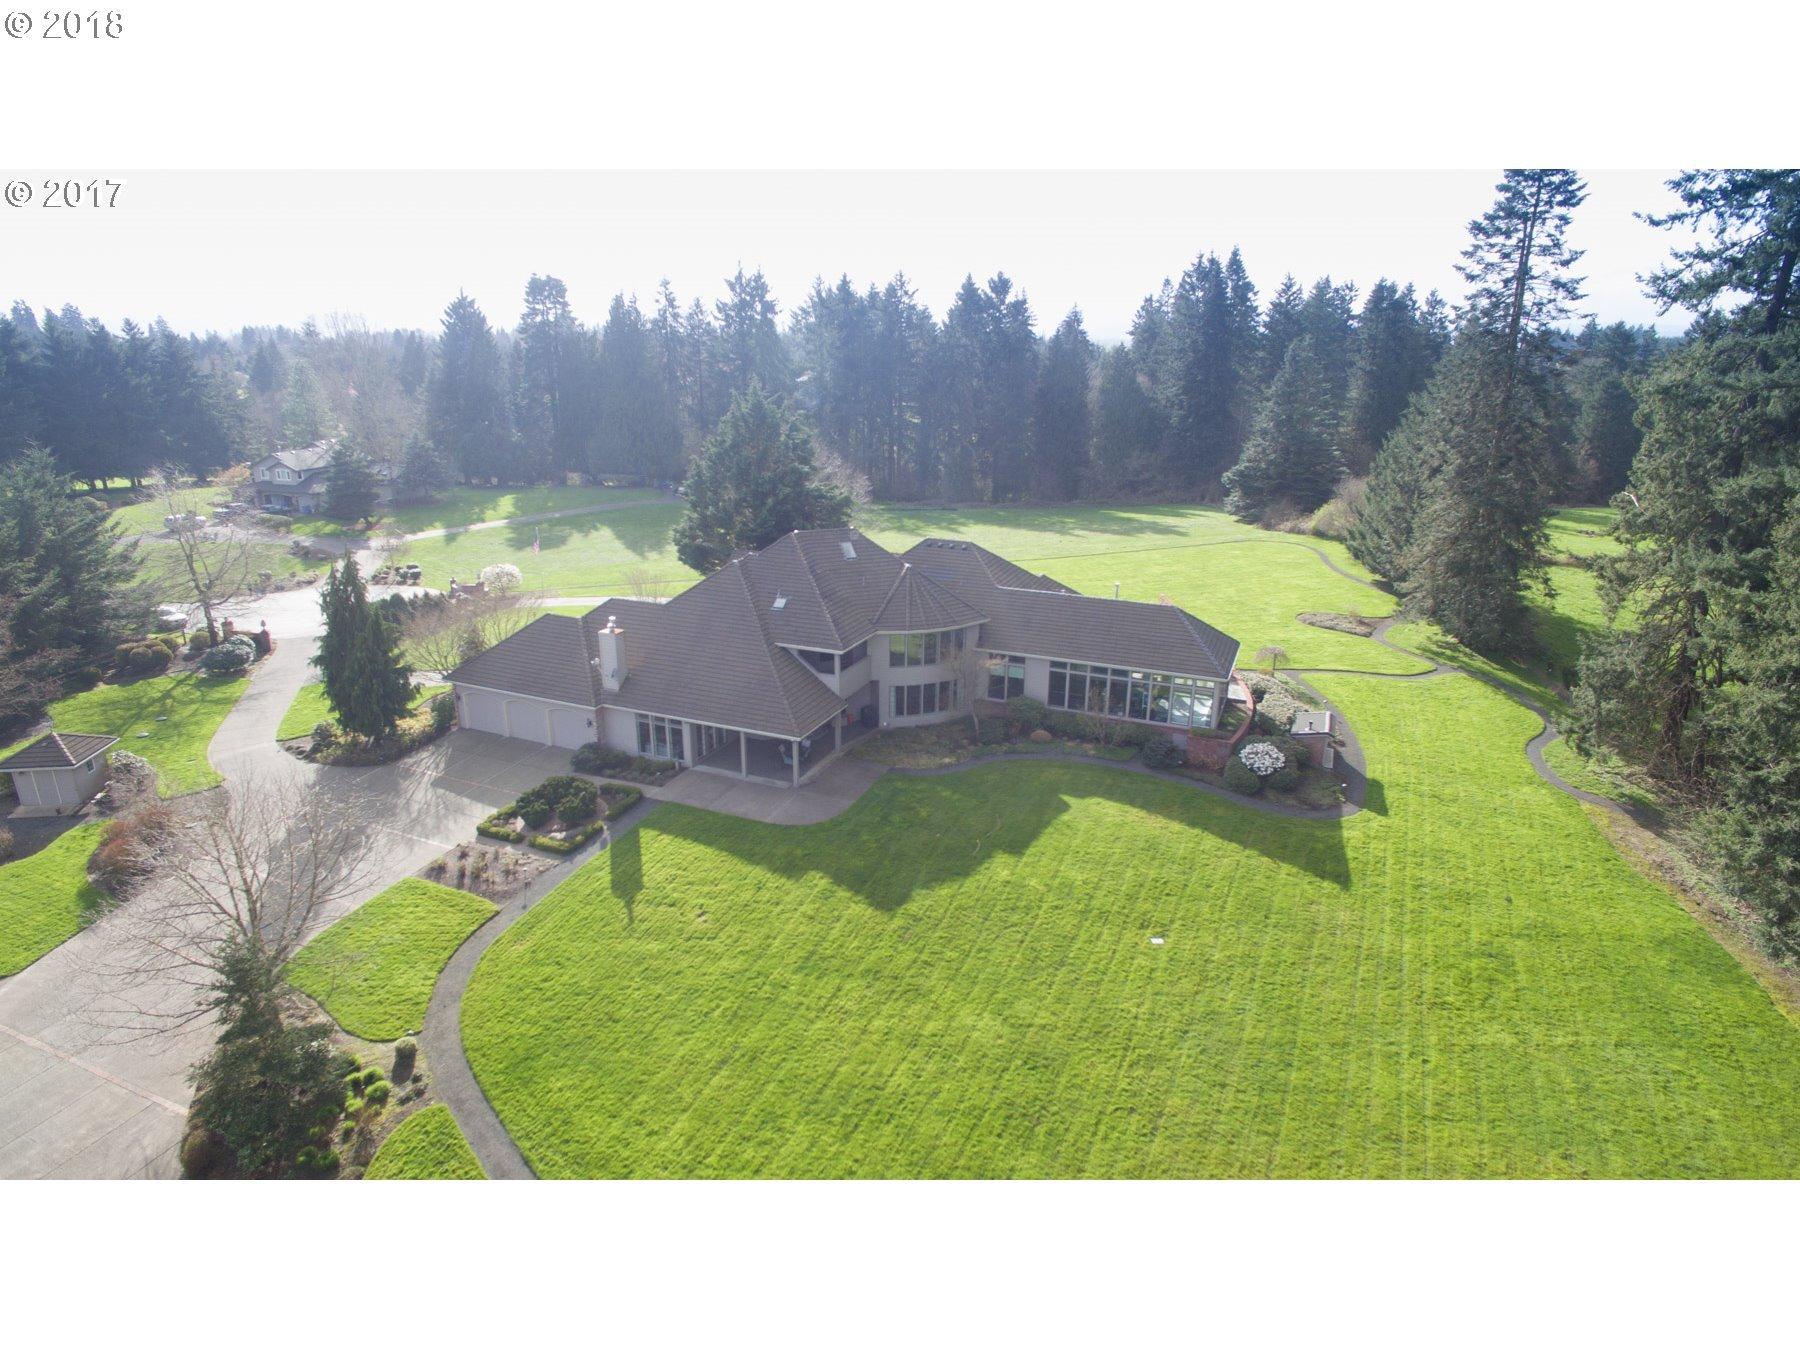 16300 NW 31st Ct, Vancouver, WA 98685